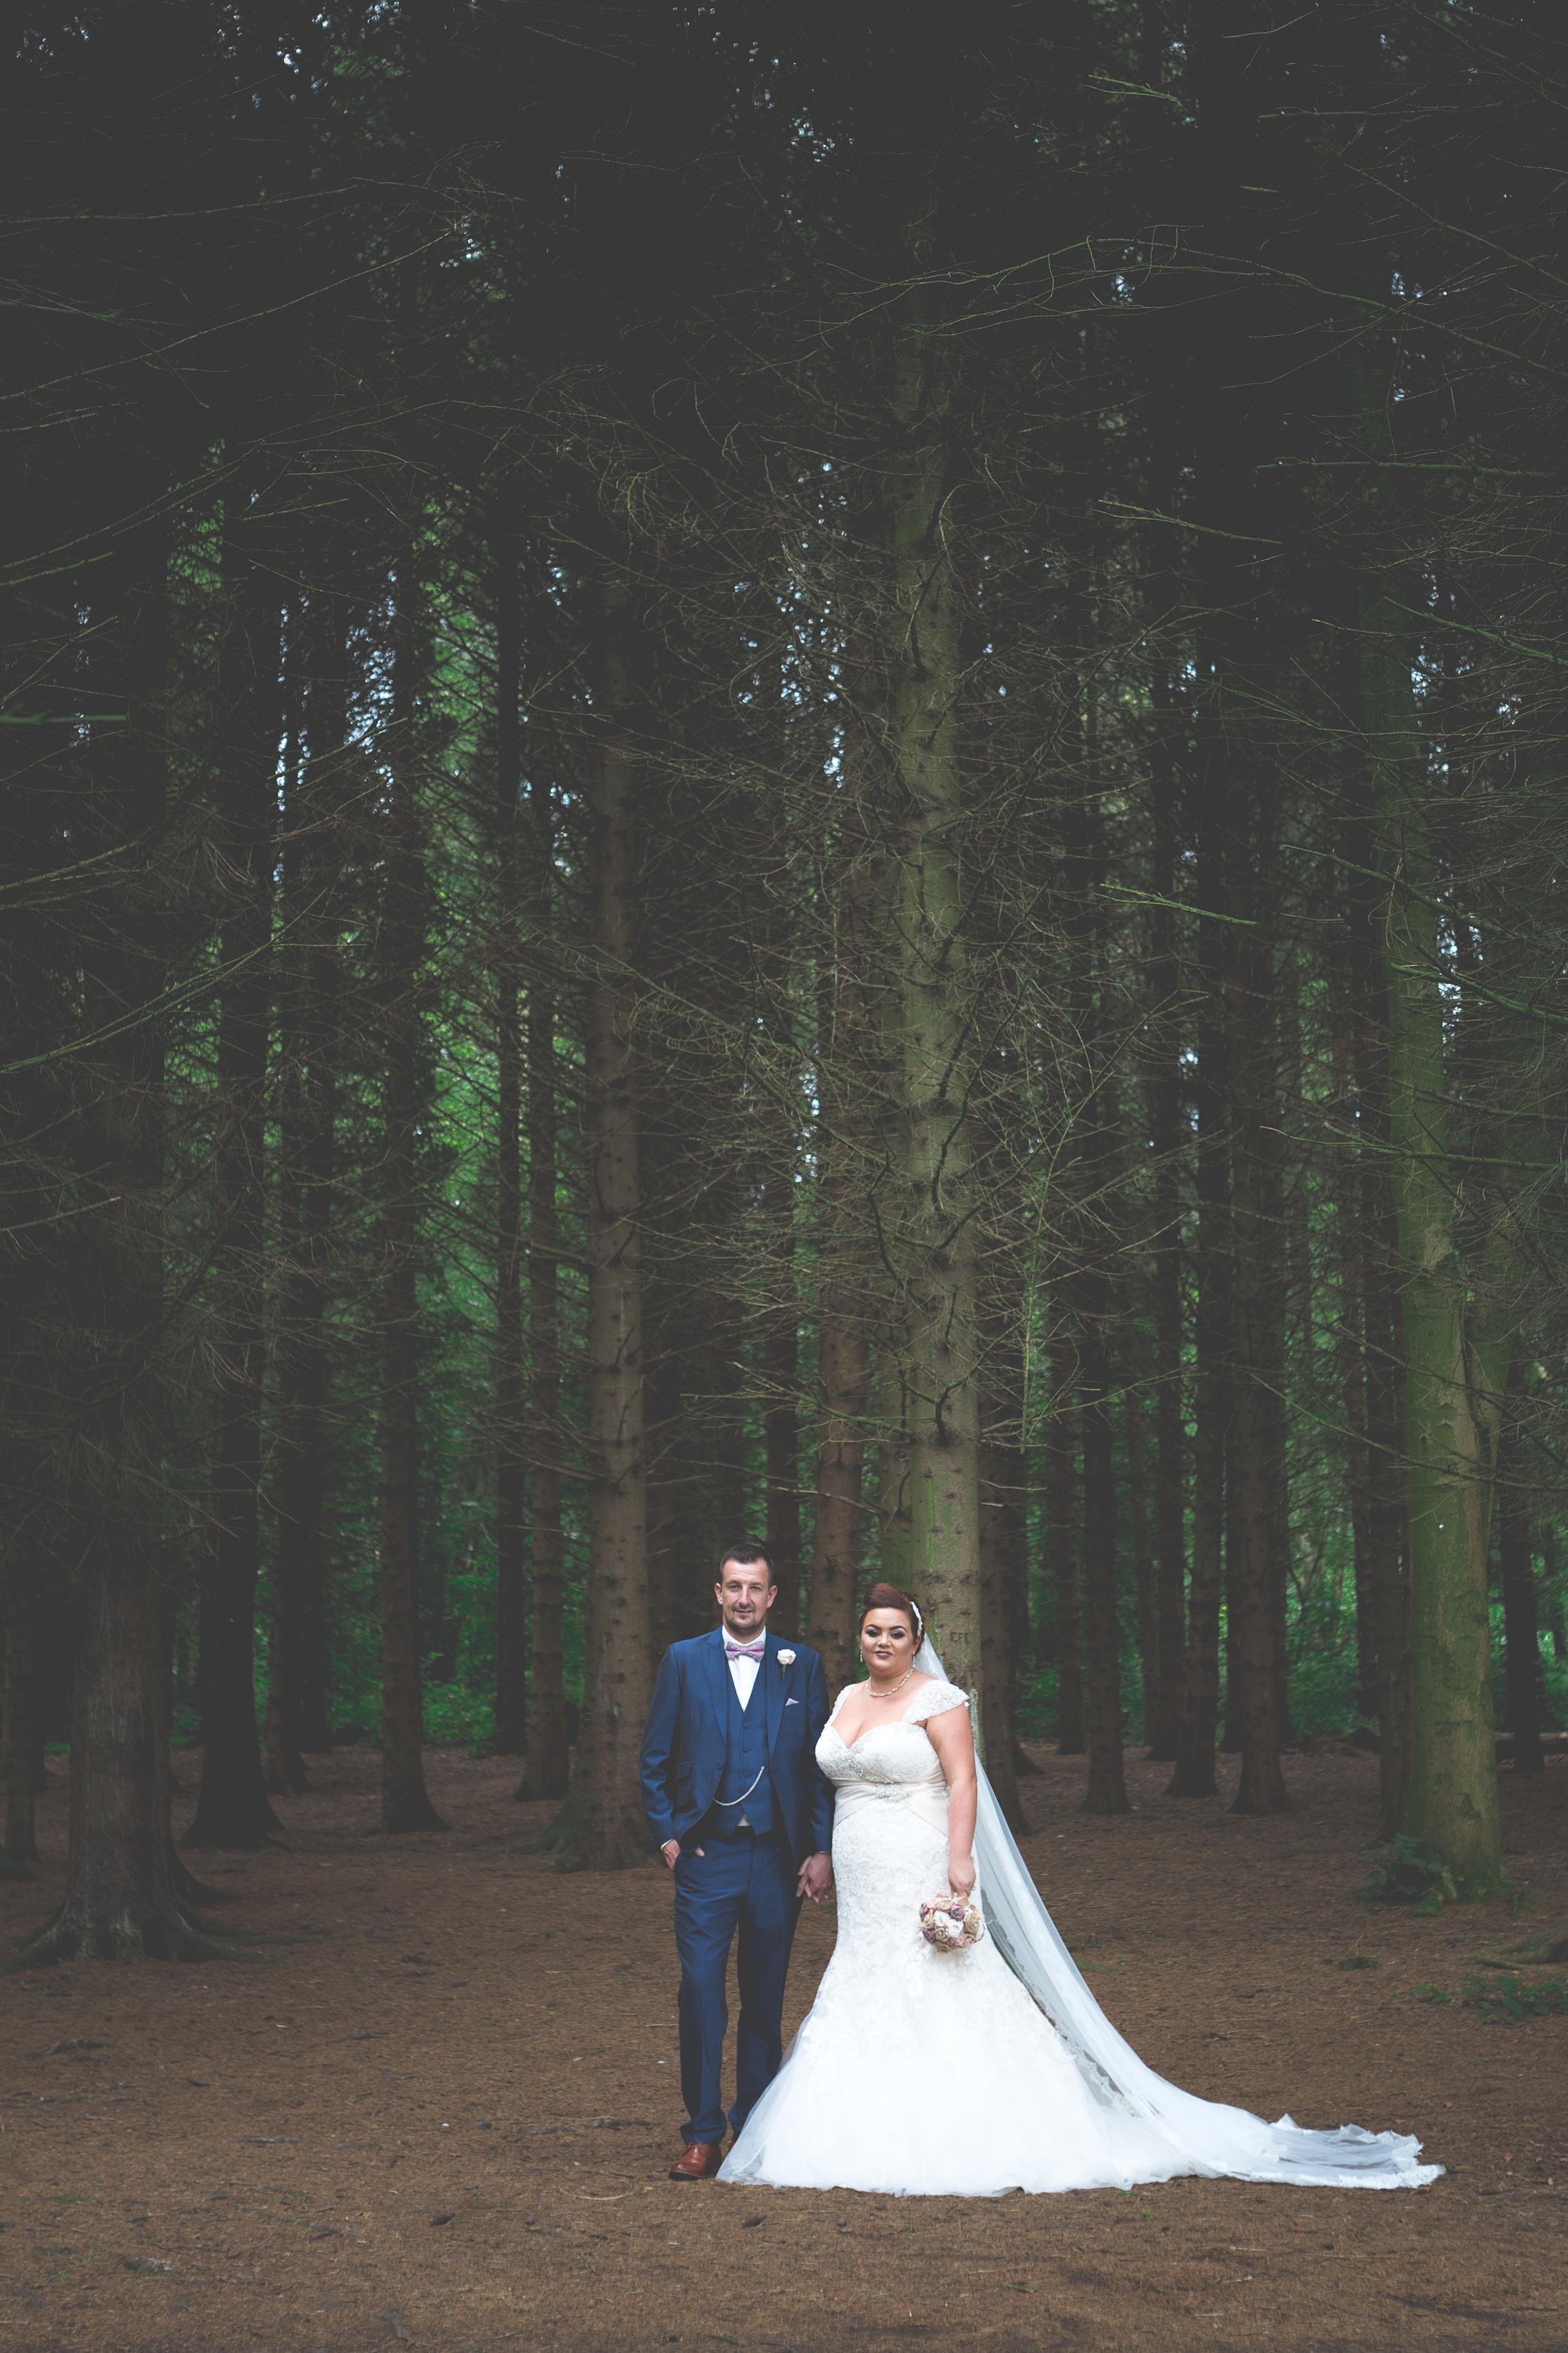 Antoinette & Stephen - Portraits   Brian McEwan Photography   Wedding Photographer Northern Ireland 18.jpg